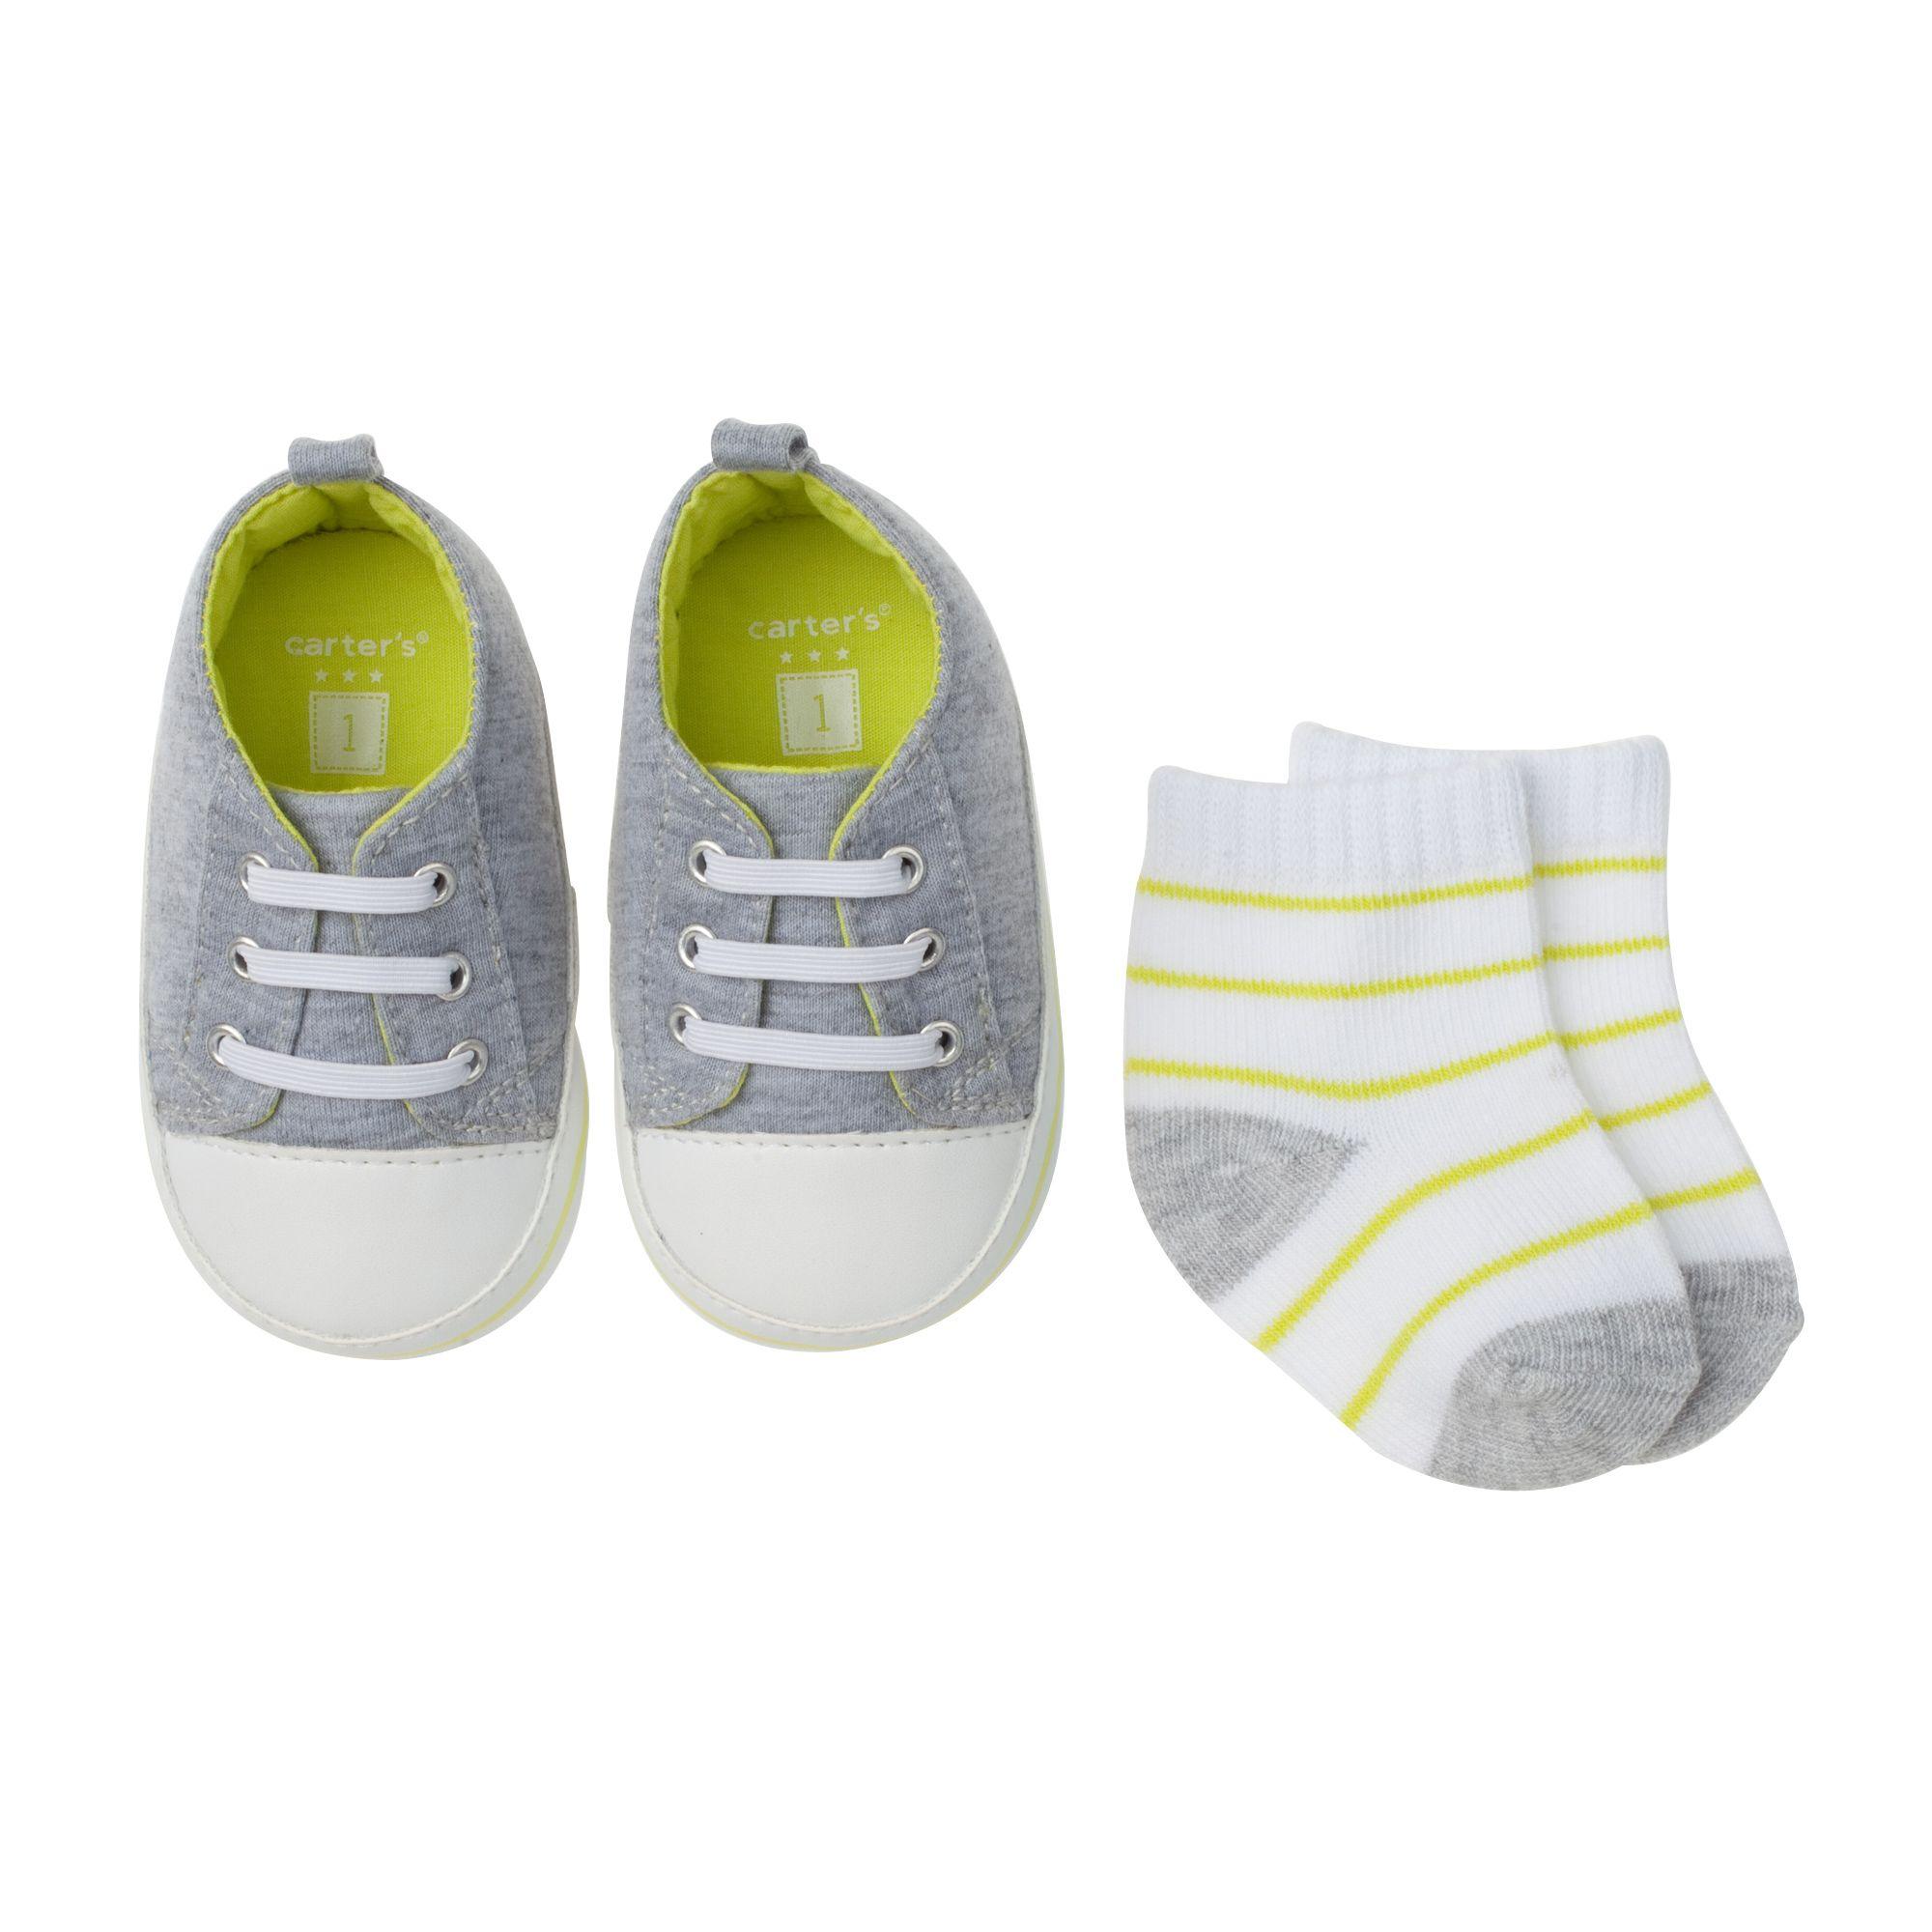 sneakers & sock set